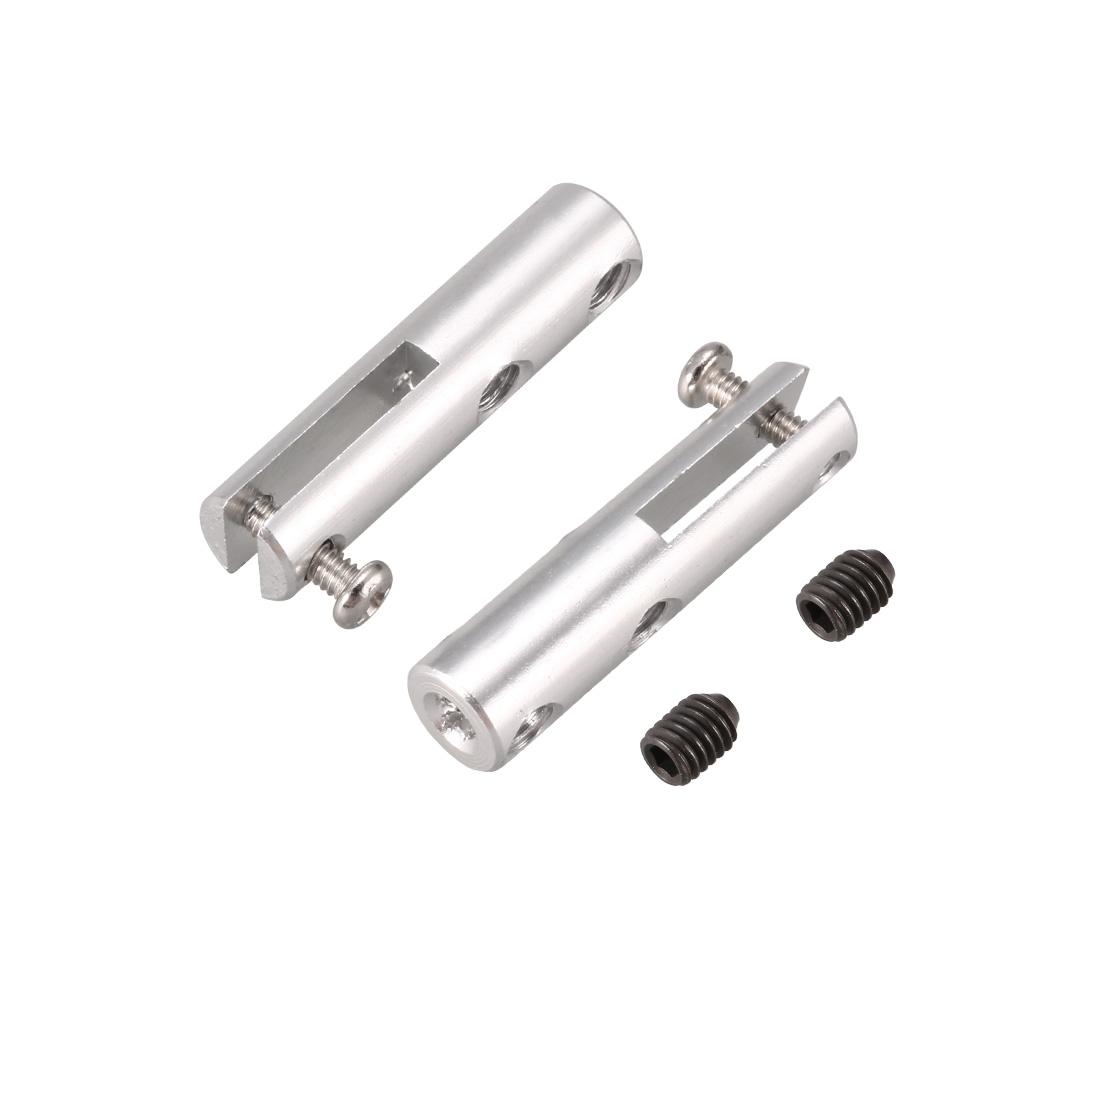 2pcs Silver Tone Aluminum Clevis 25 x 6 x 2.3mm for 2.3mm Push Rod